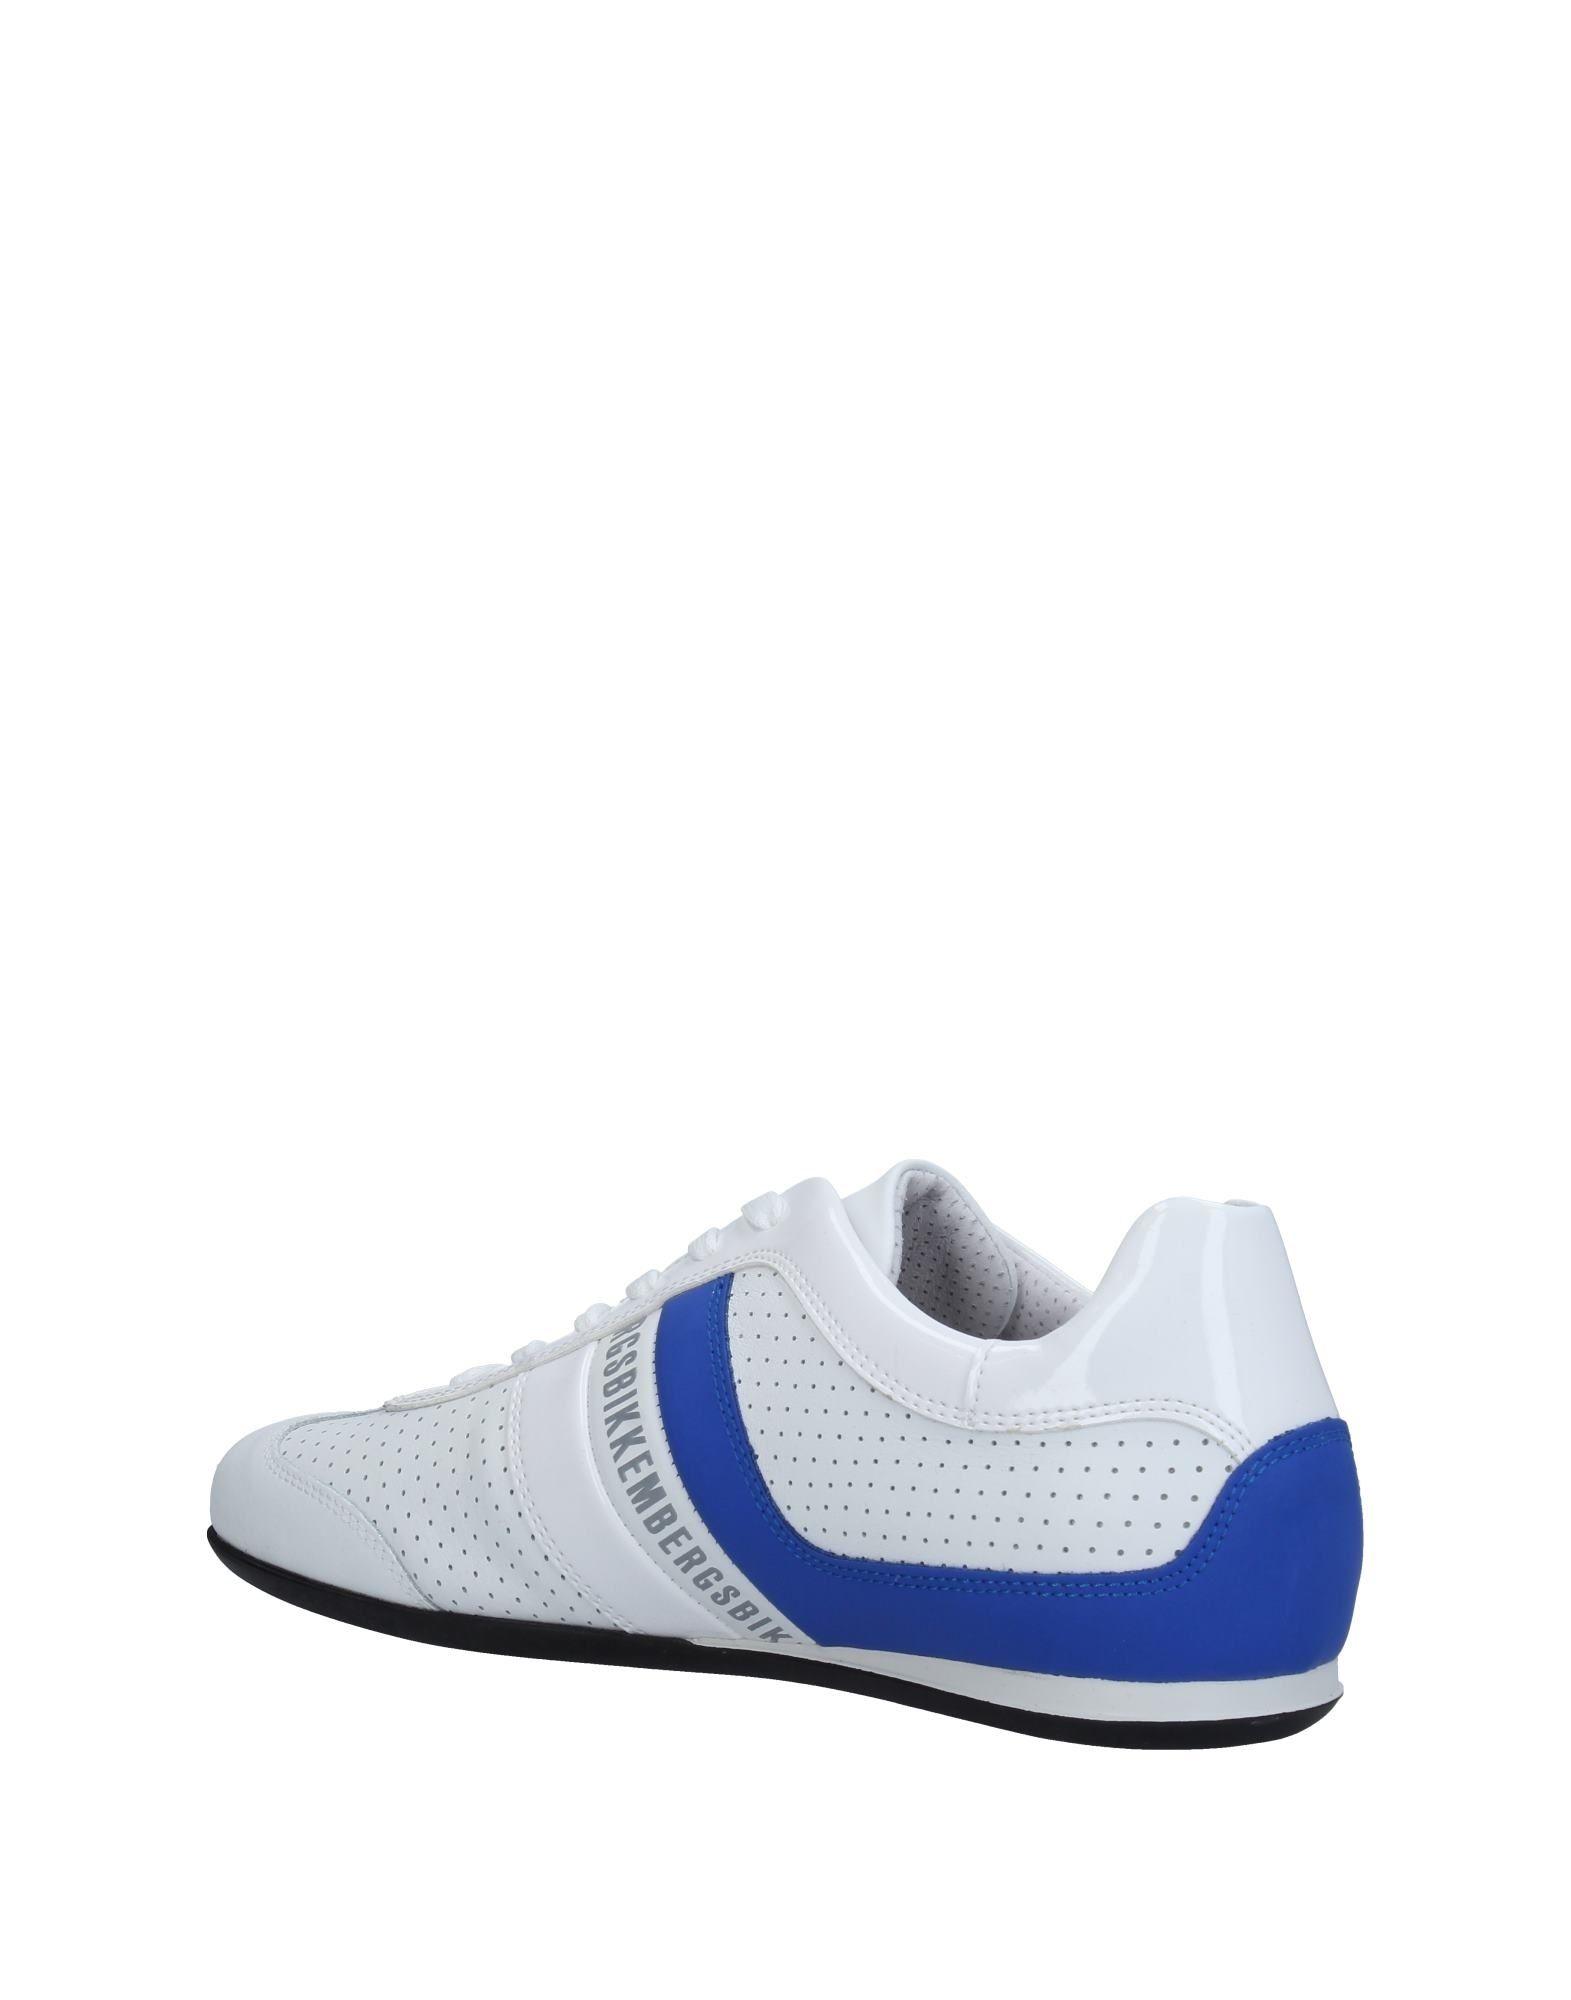 A buon mercato Sneakers Bikkembergs Uomo - 11332130WW